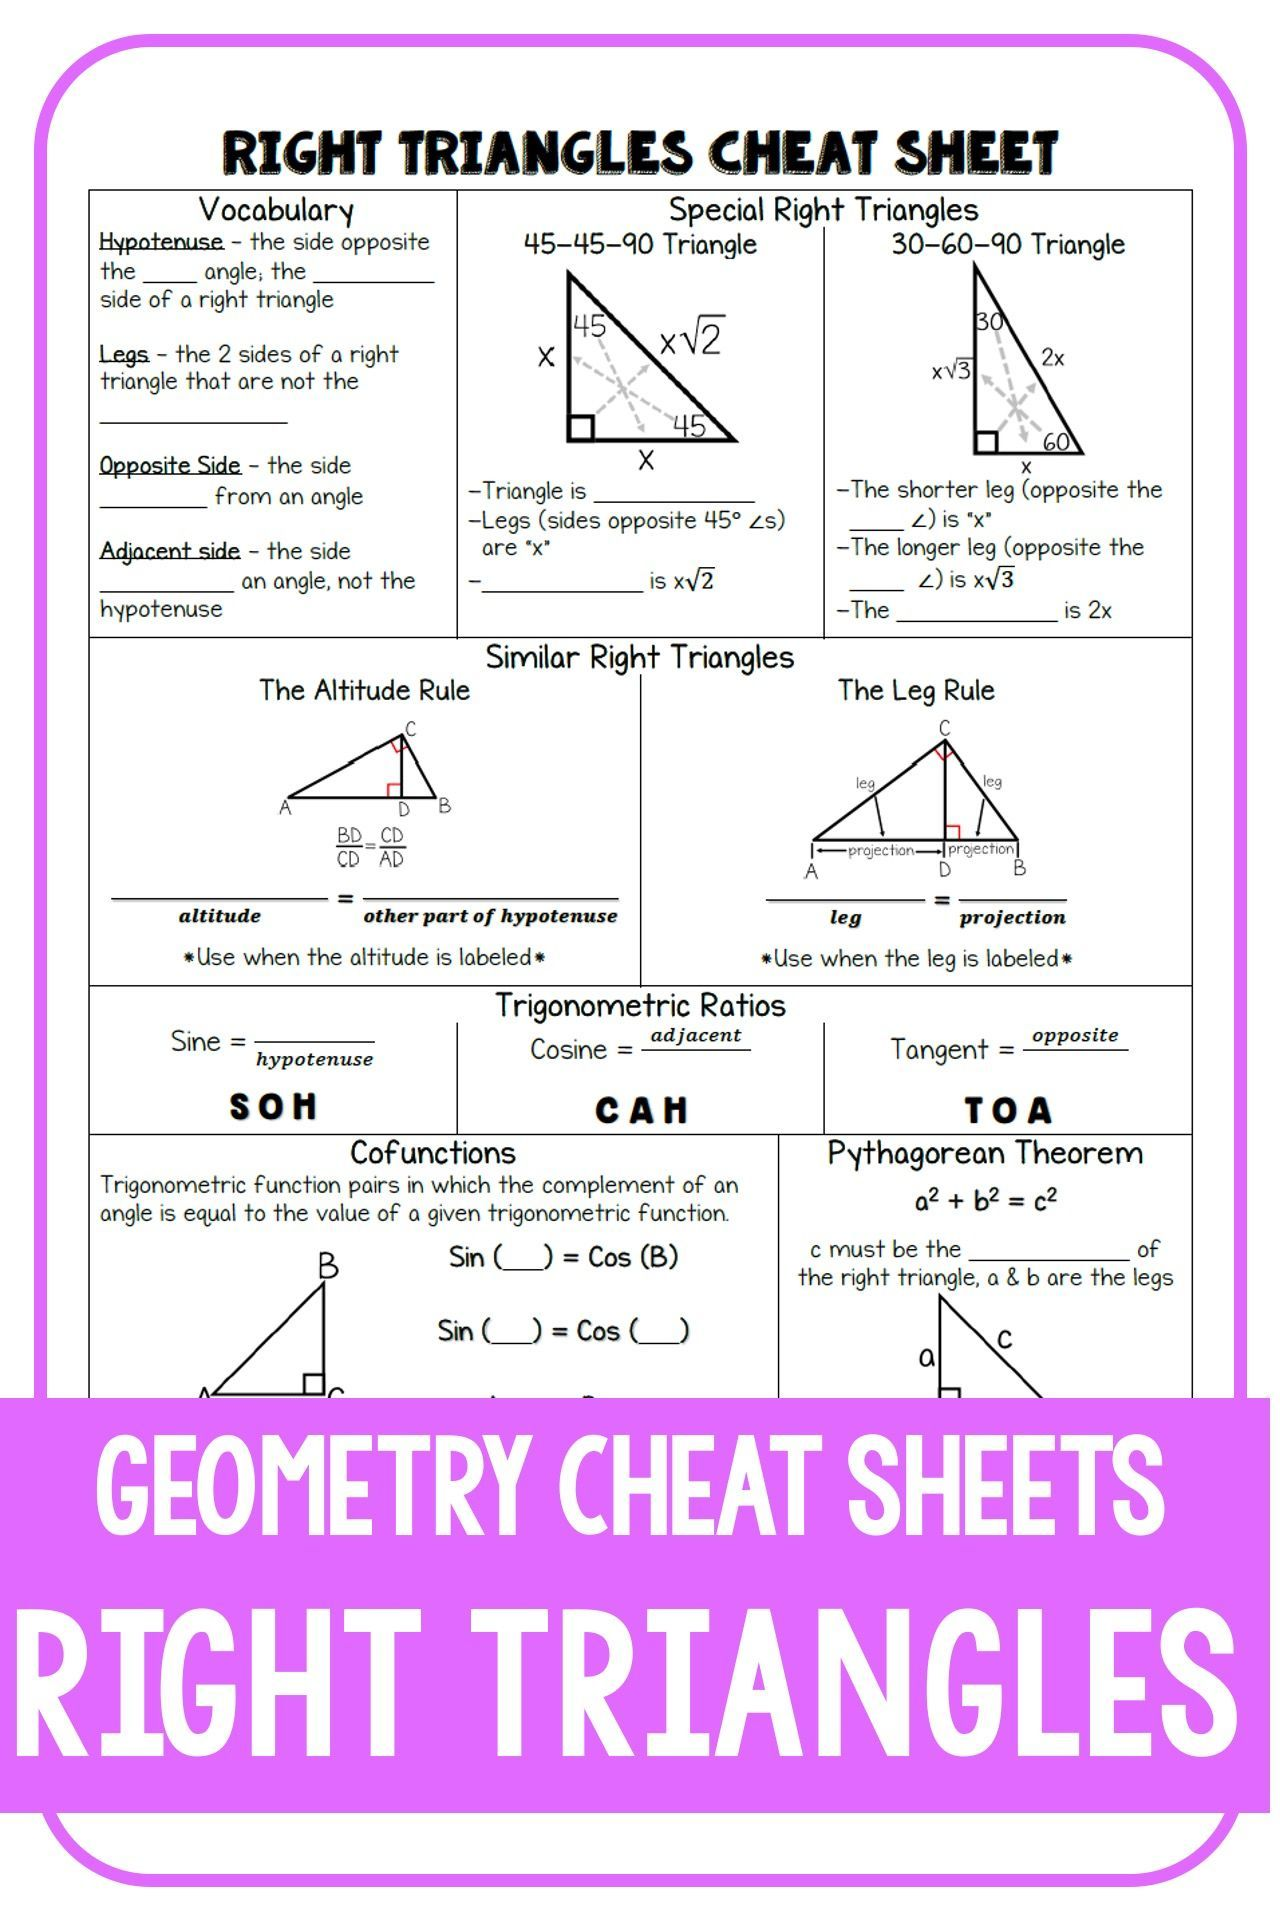 medium resolution of Geometry Cheat Sheet: Right Triangles   High school math teacher